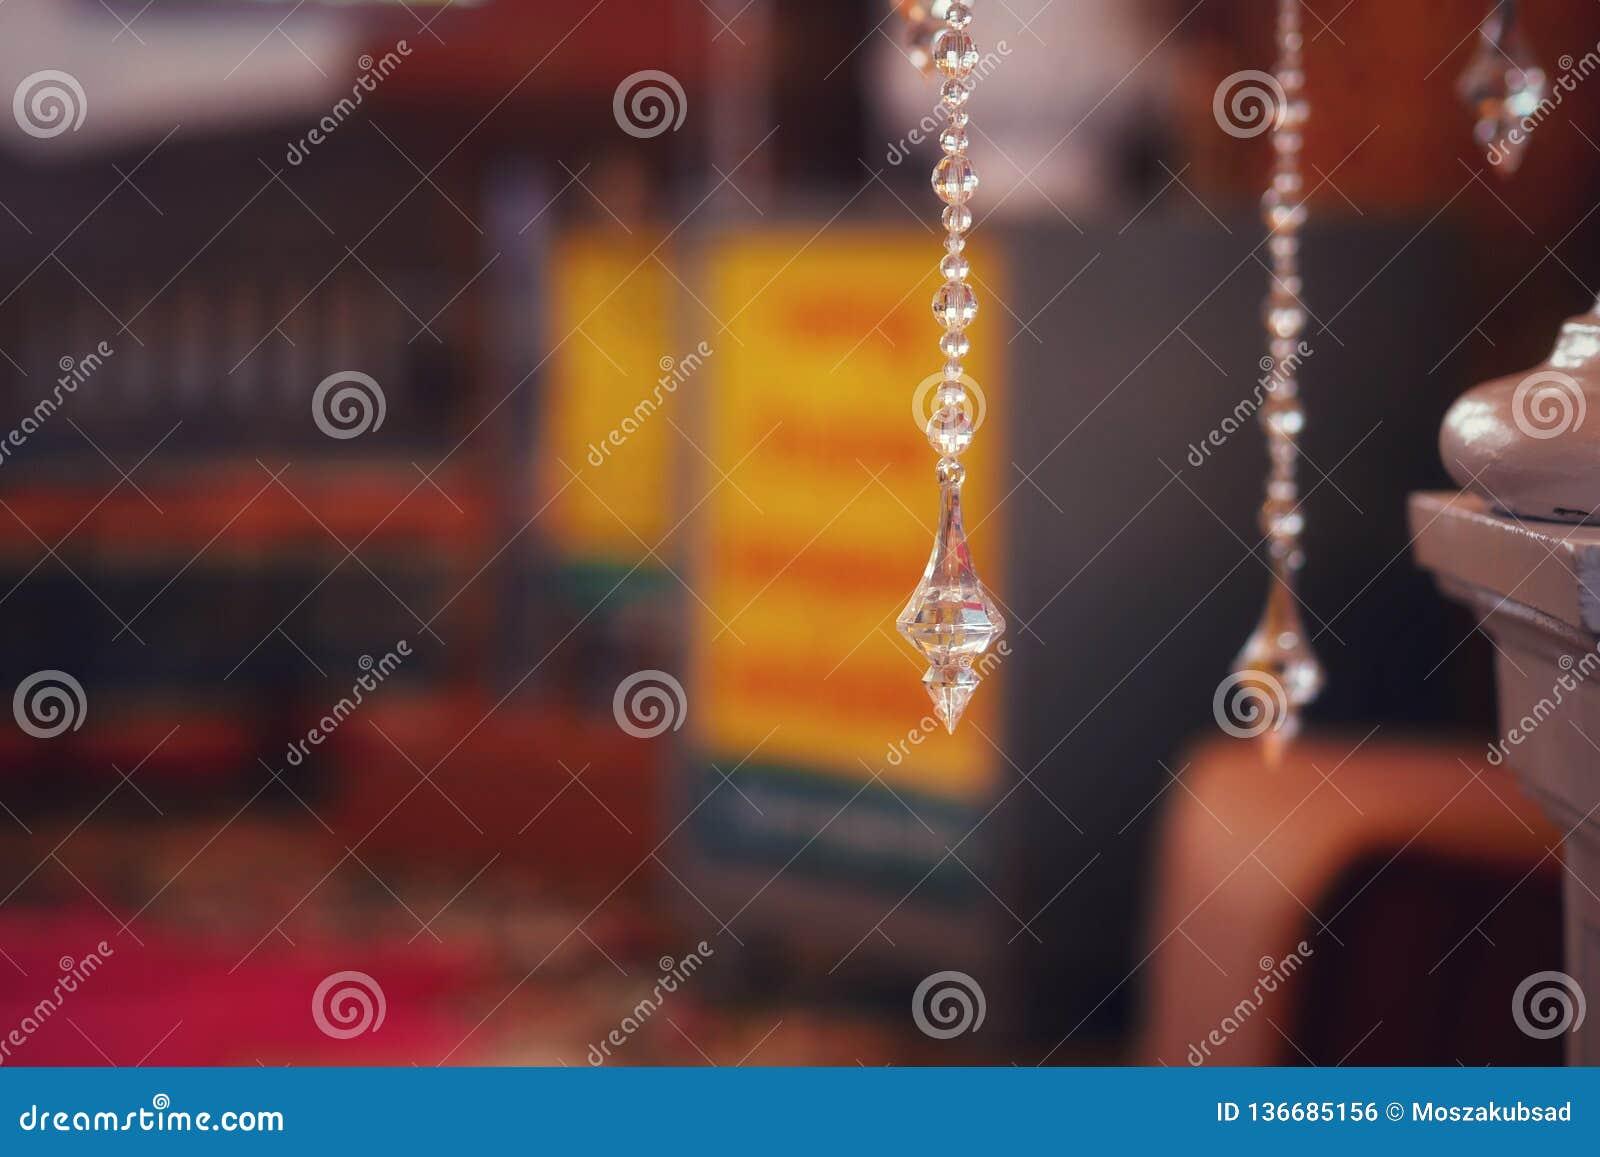 Crystal Hanging or Pendulum Crystal